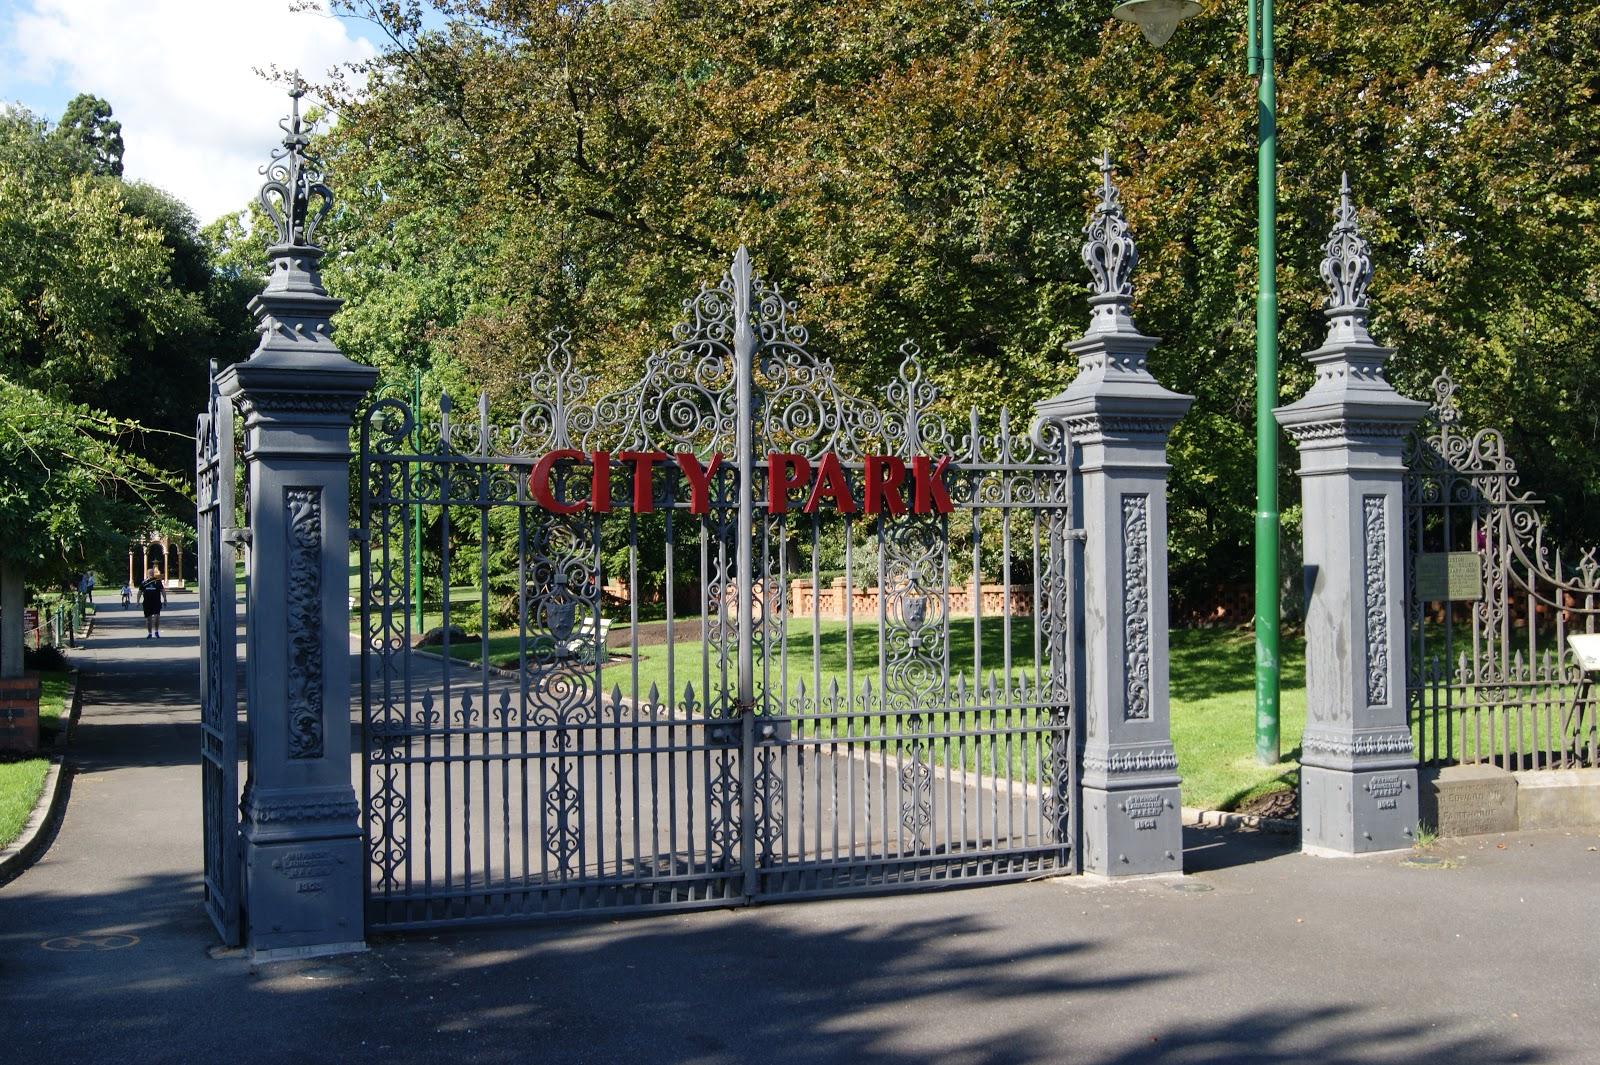 On The Convict Trail: City Park, Launceston